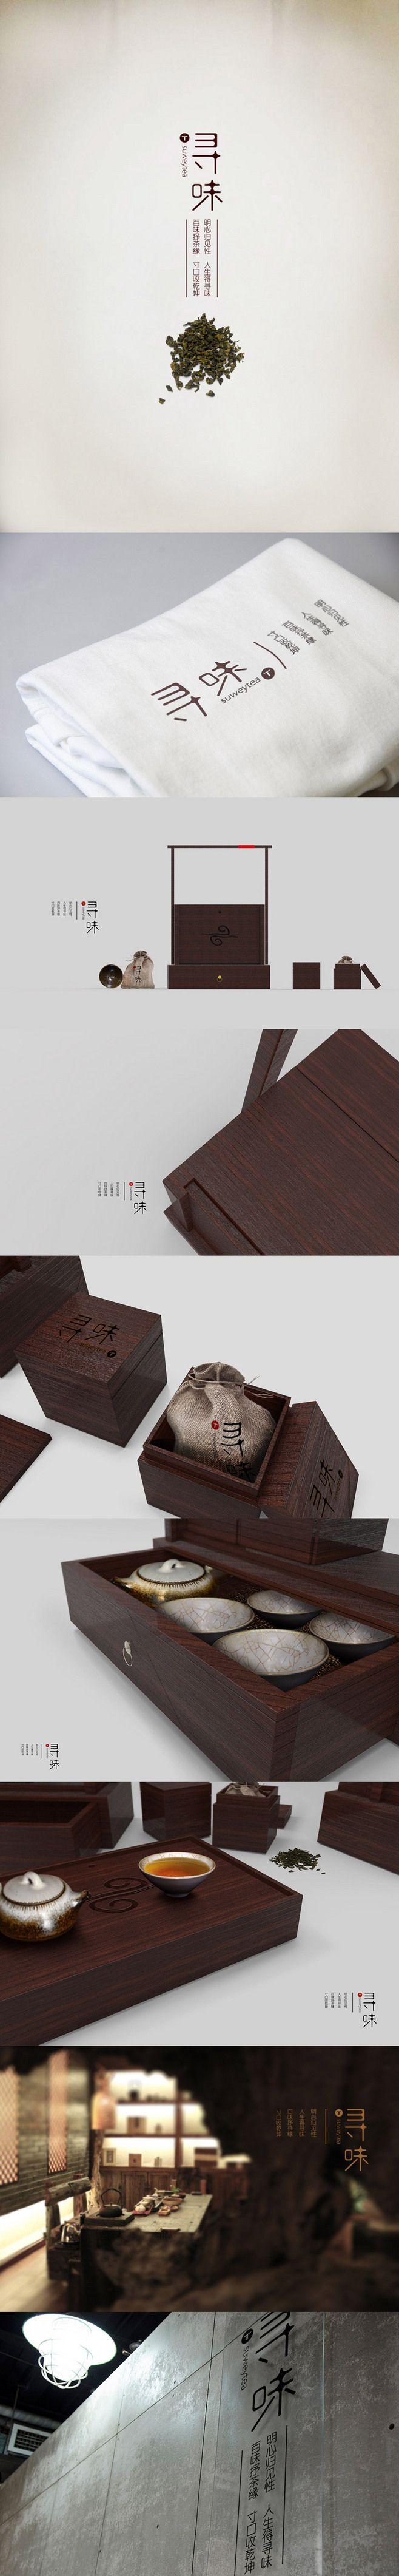 packaging / package design | 尋味 SuwayTea Traditional Tea Gift Box Packaging Design